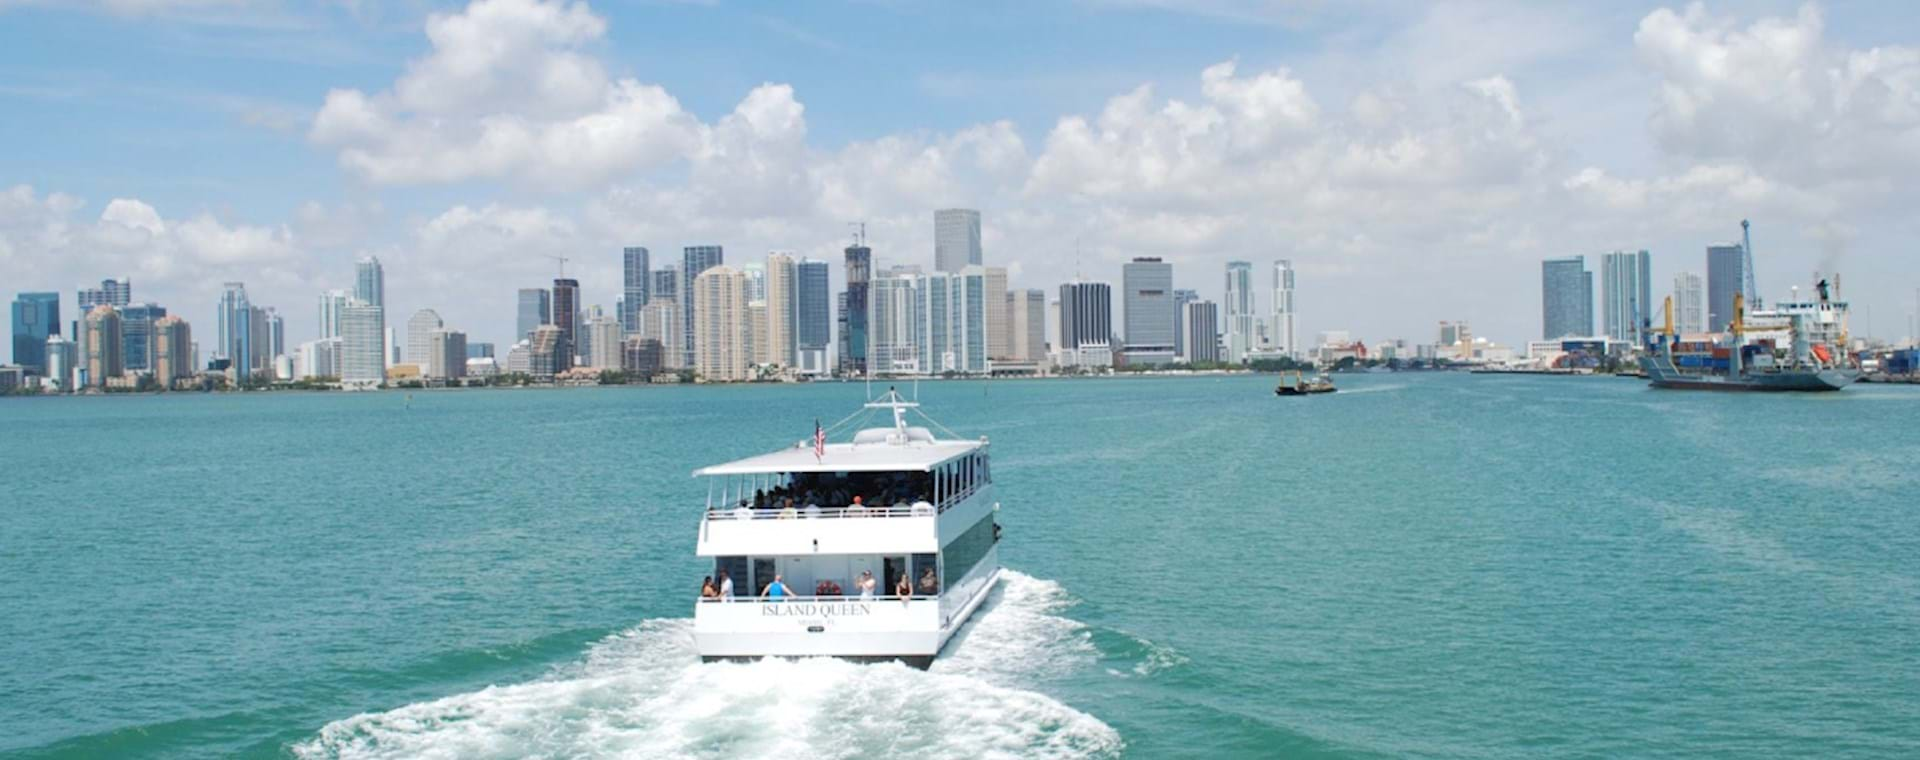 Cruising the Miami Bay